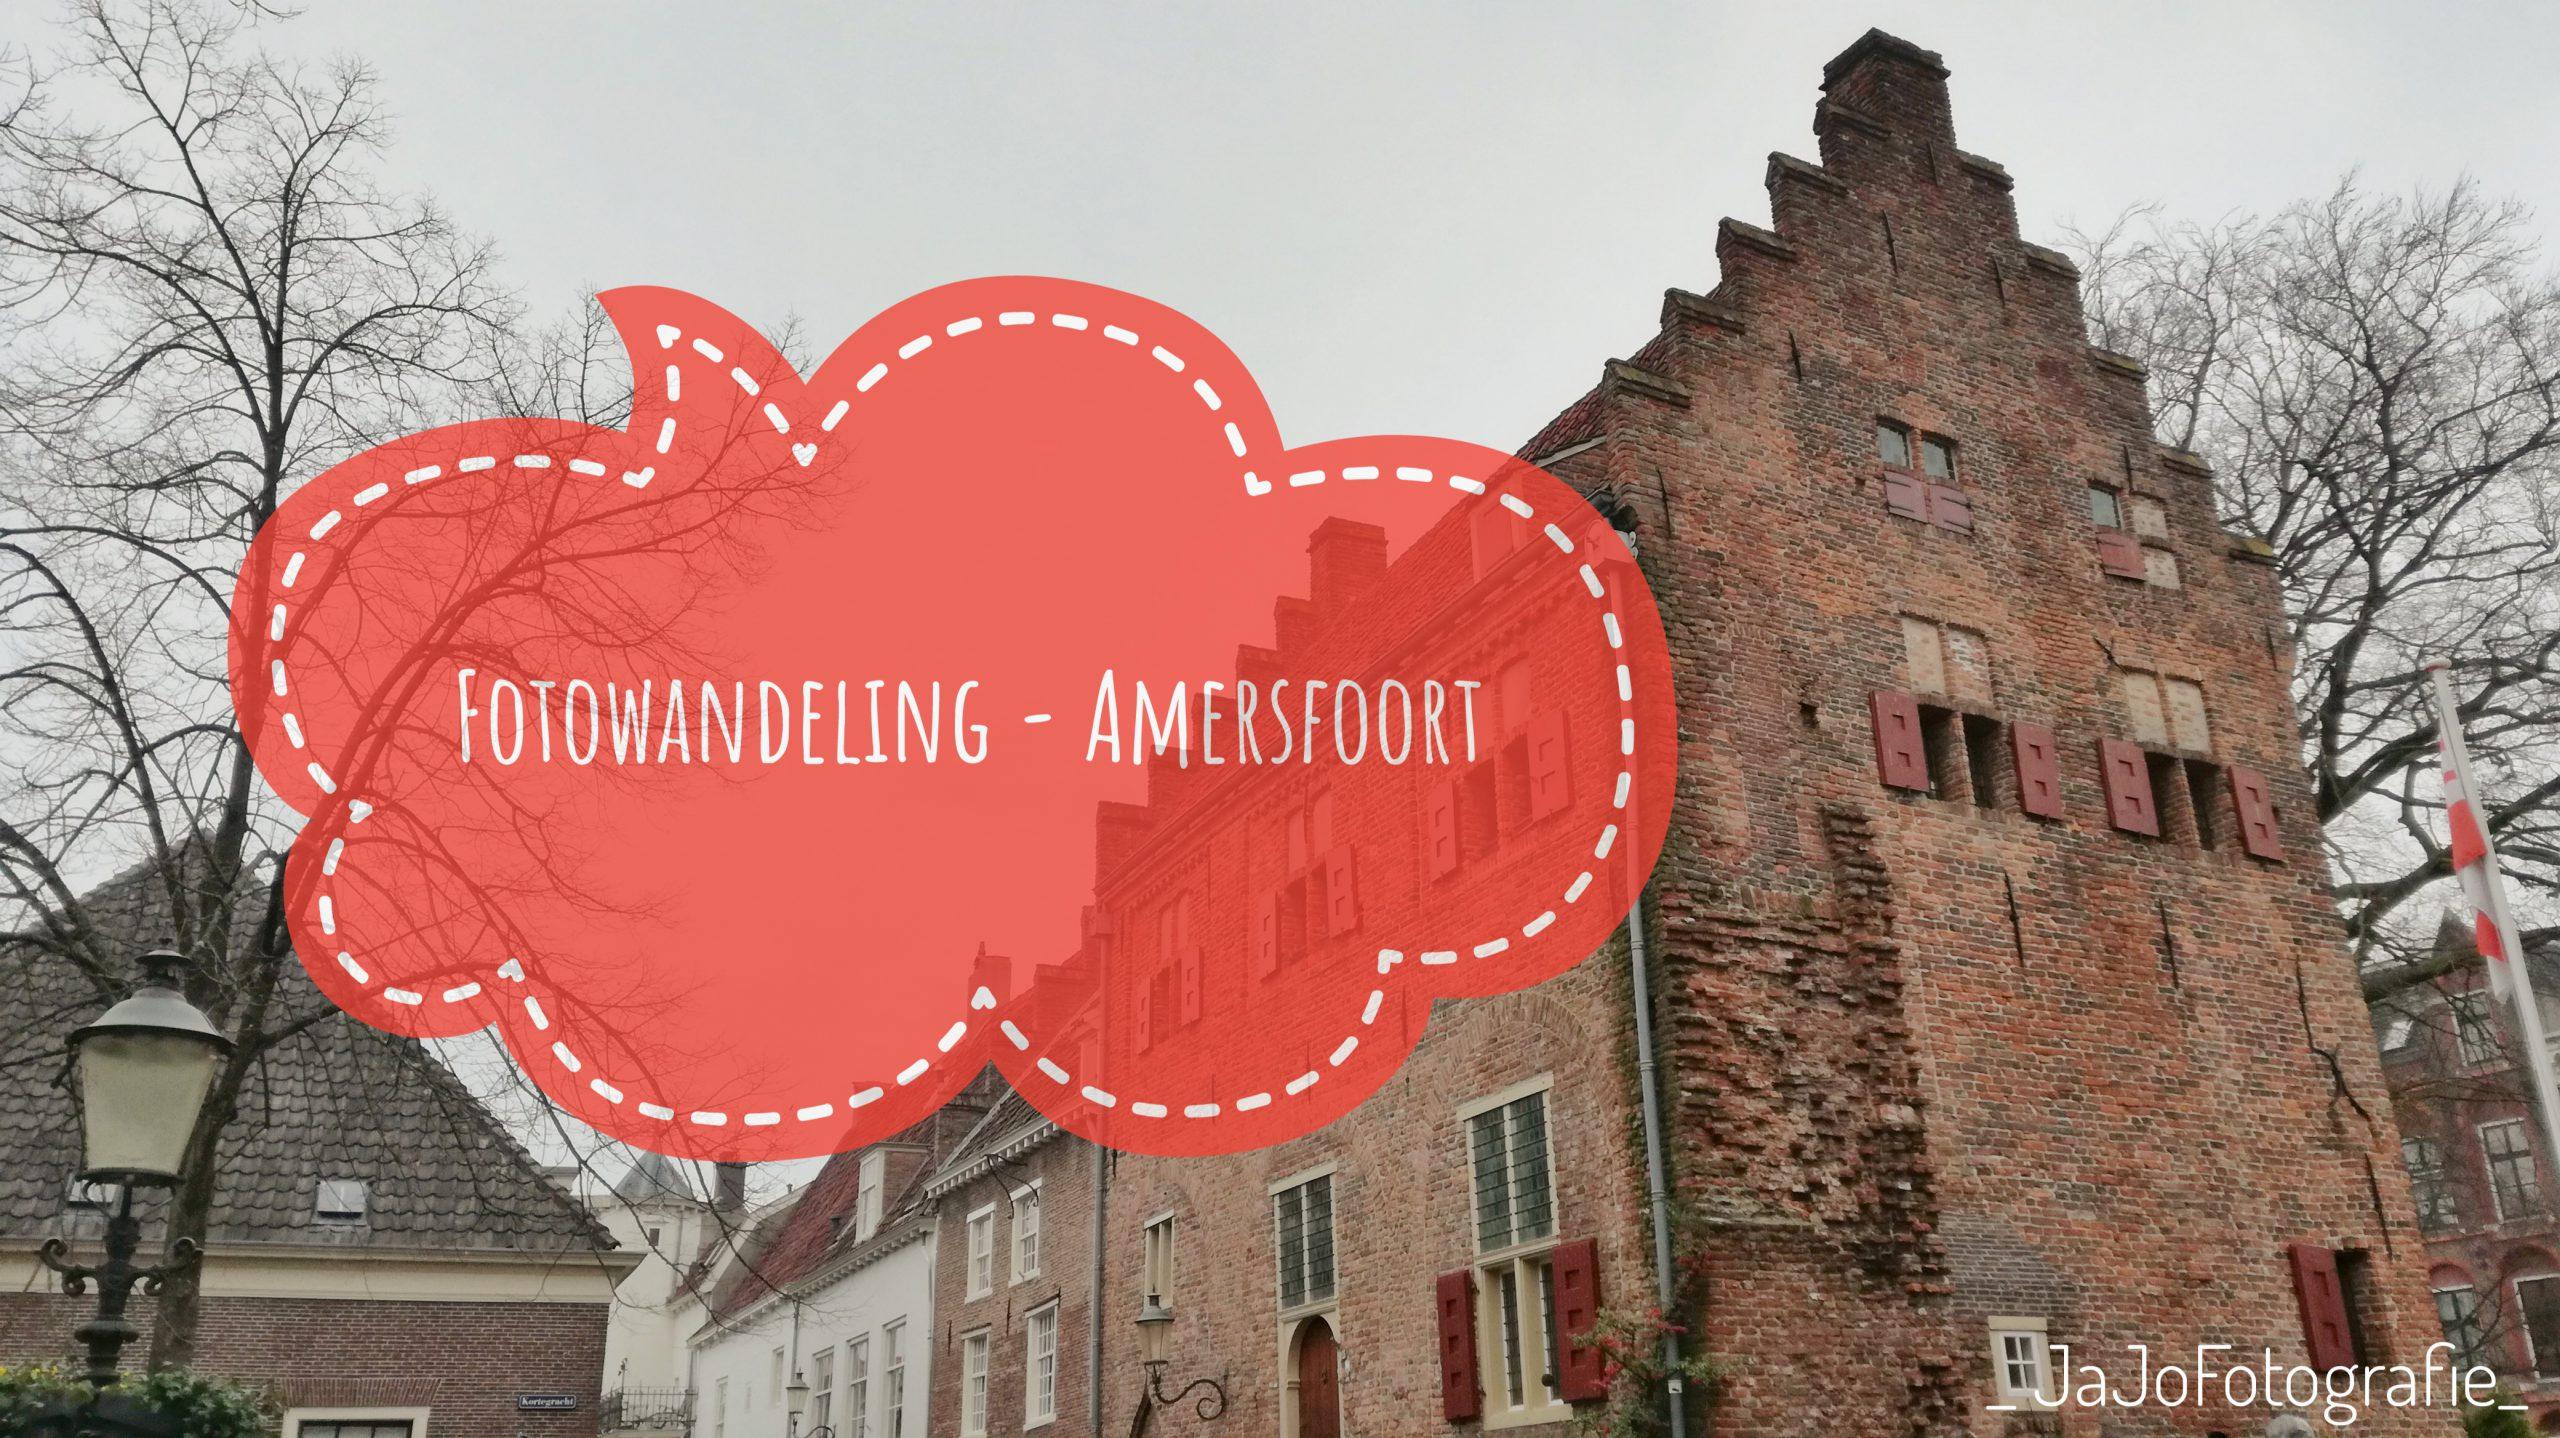 Fotowandeling – Amersfoort